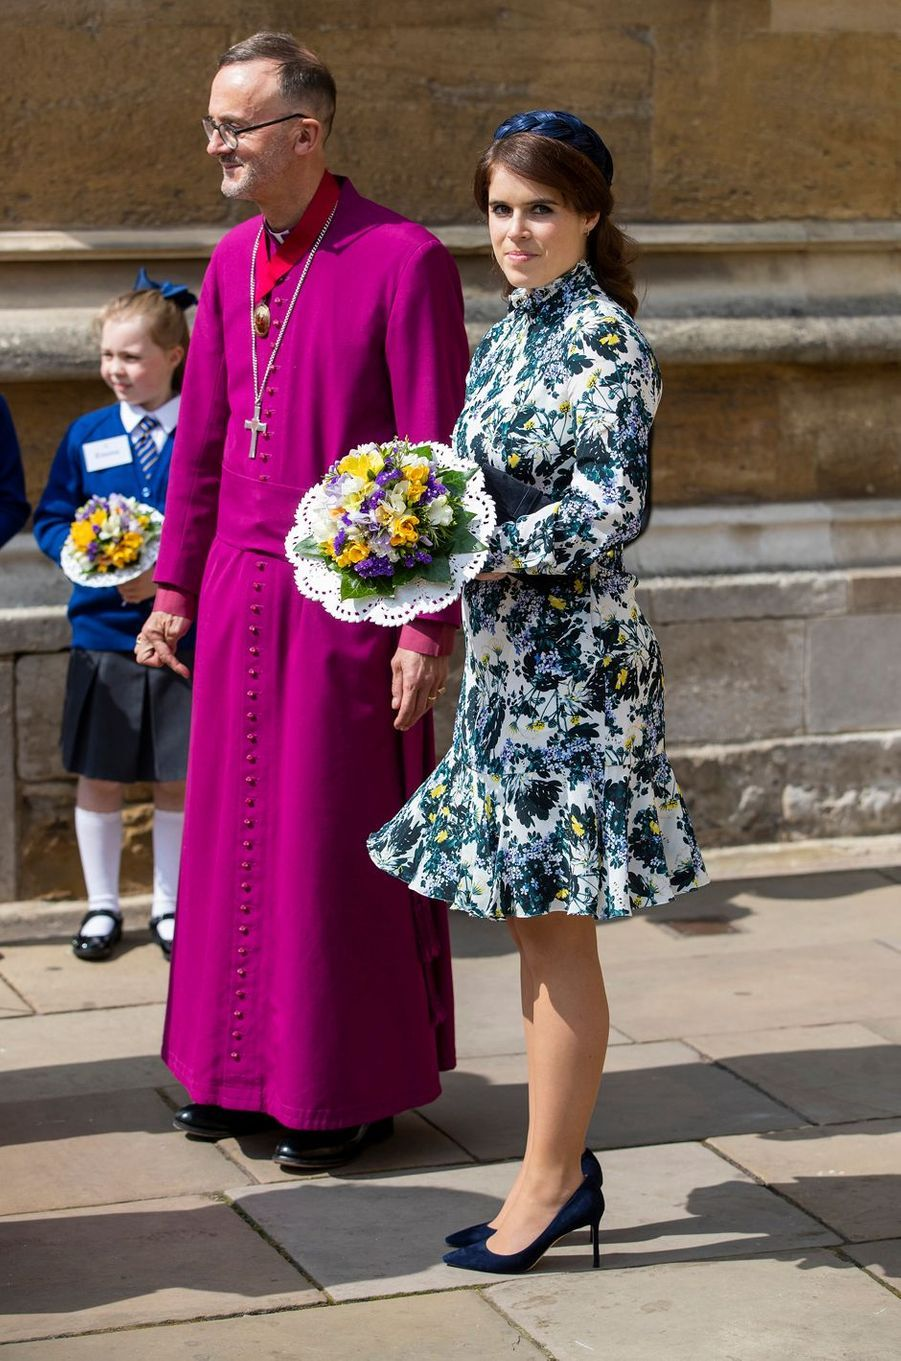 La princesse Eugenie d'York à Windsor, le 18 avril 2019